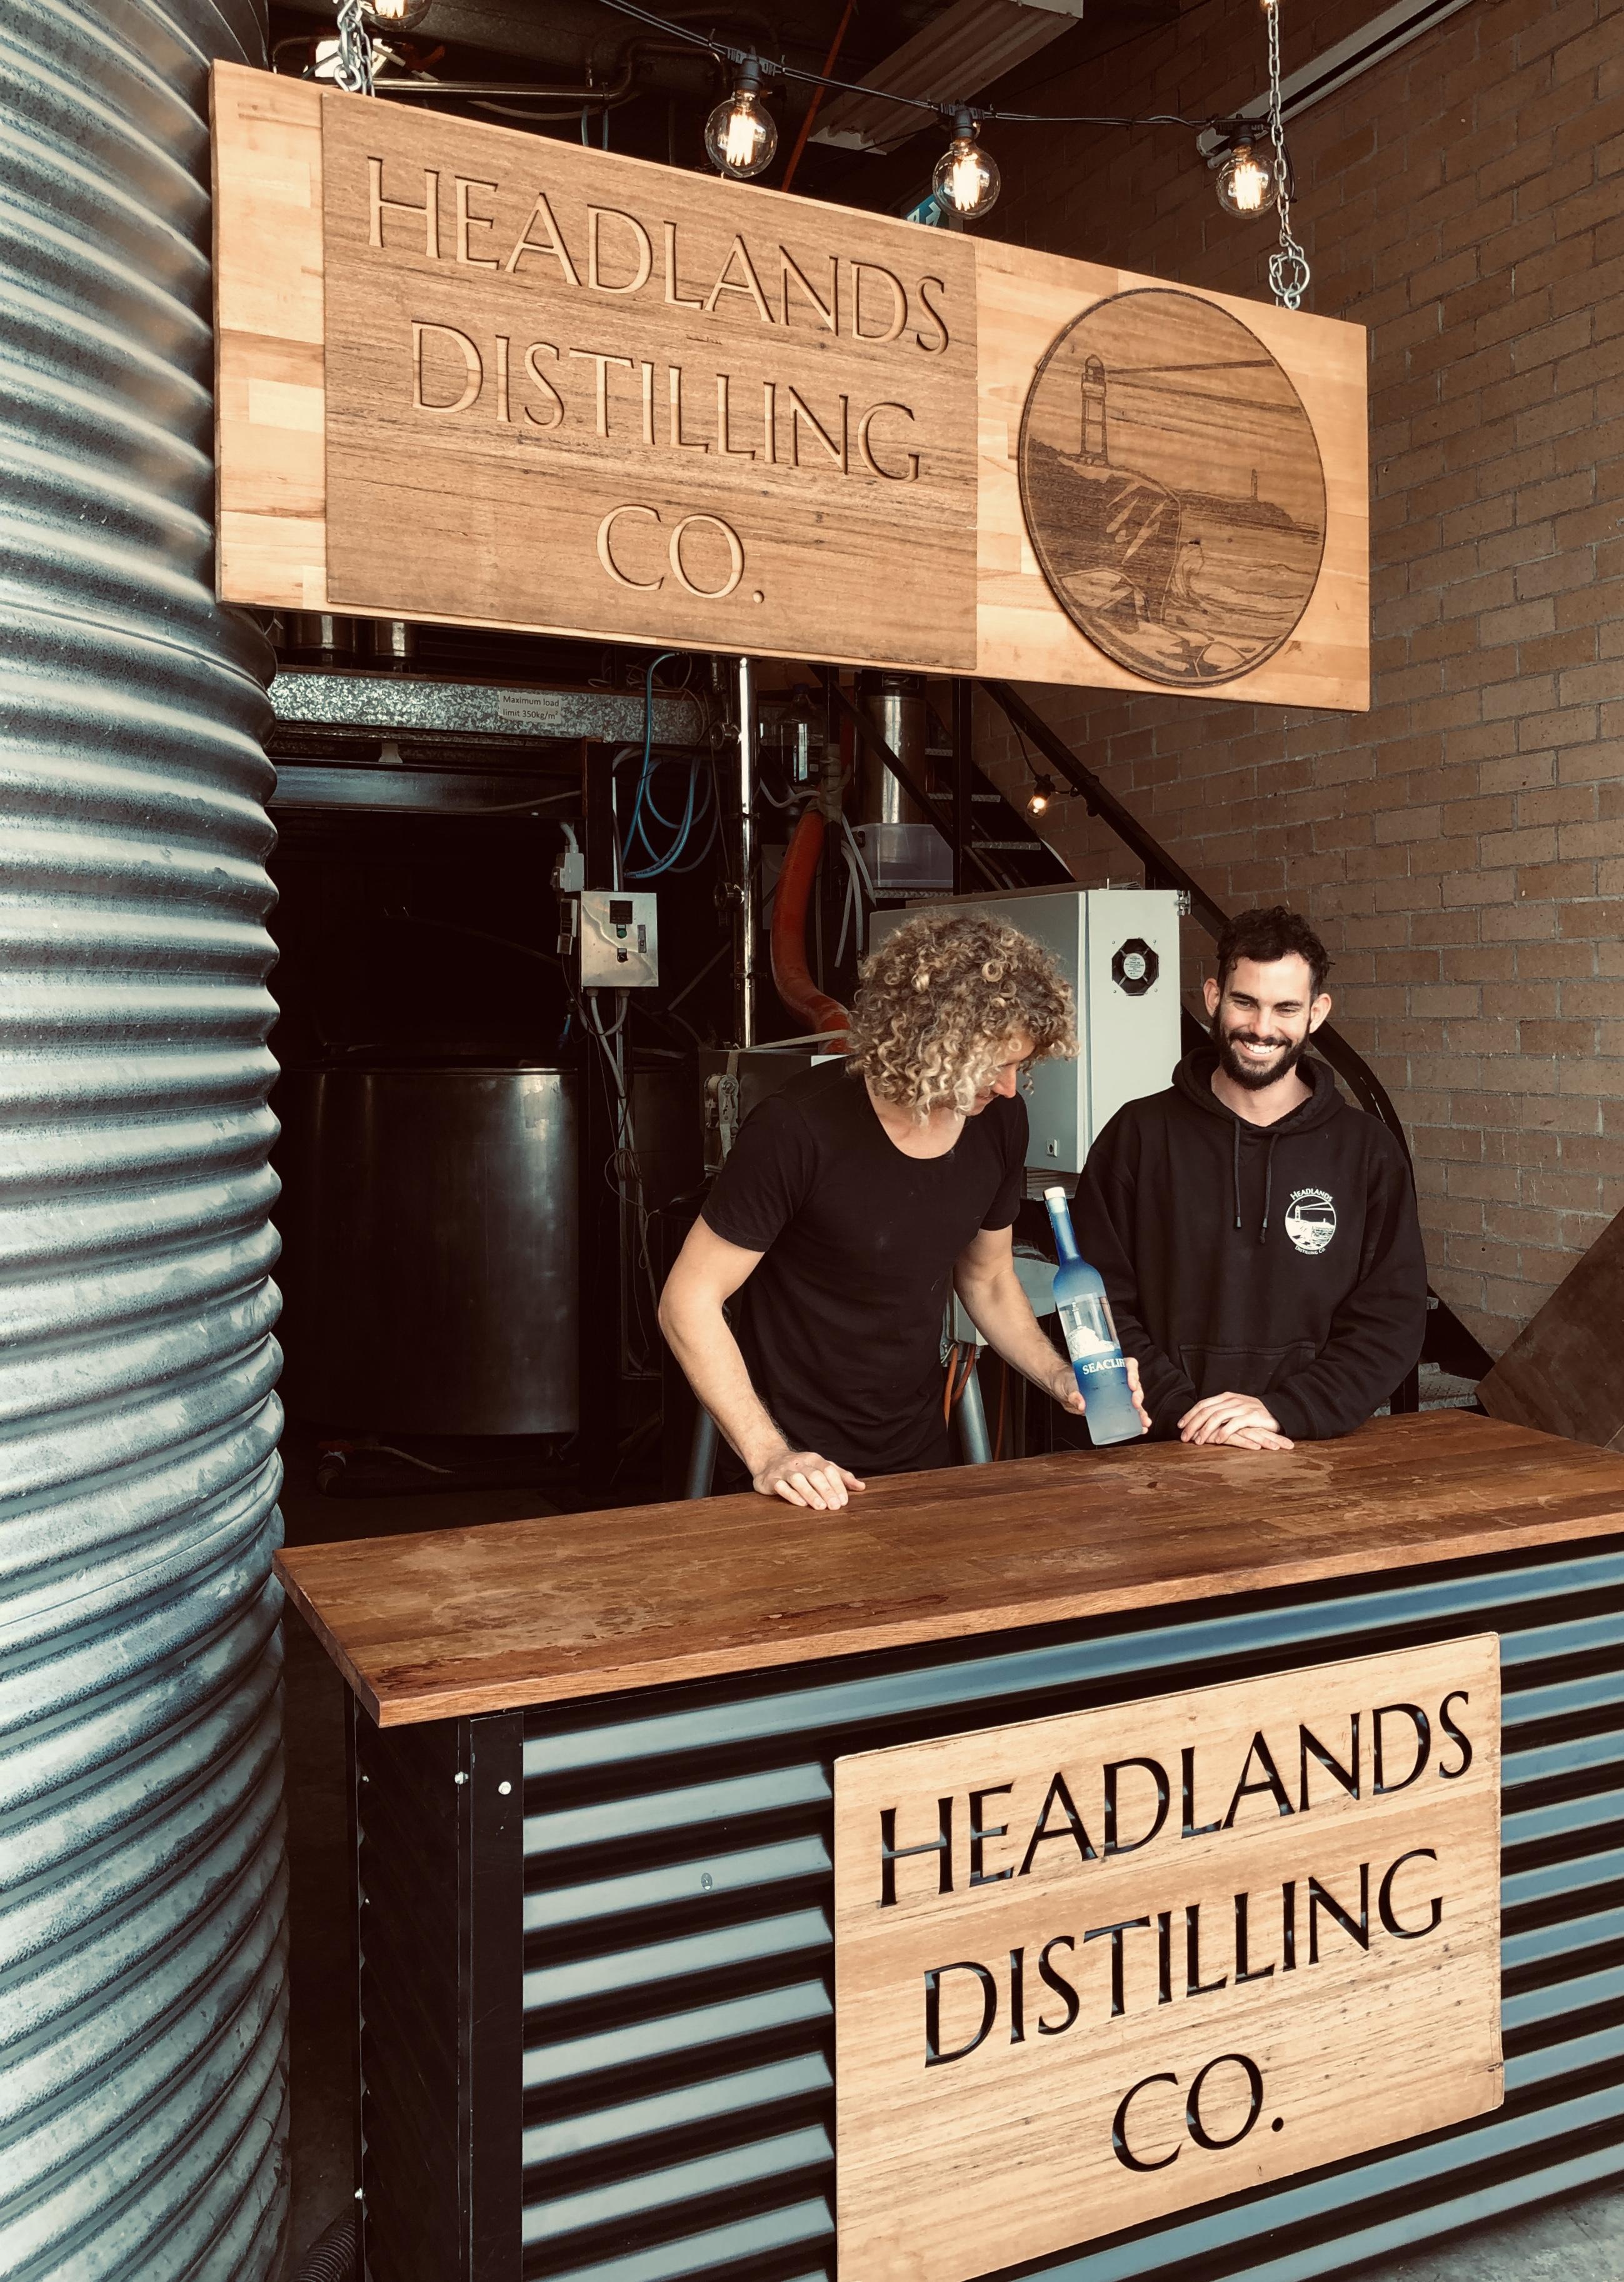 Headlands Distilling Co ,Wollongong - Wollongong's first vodka distillery